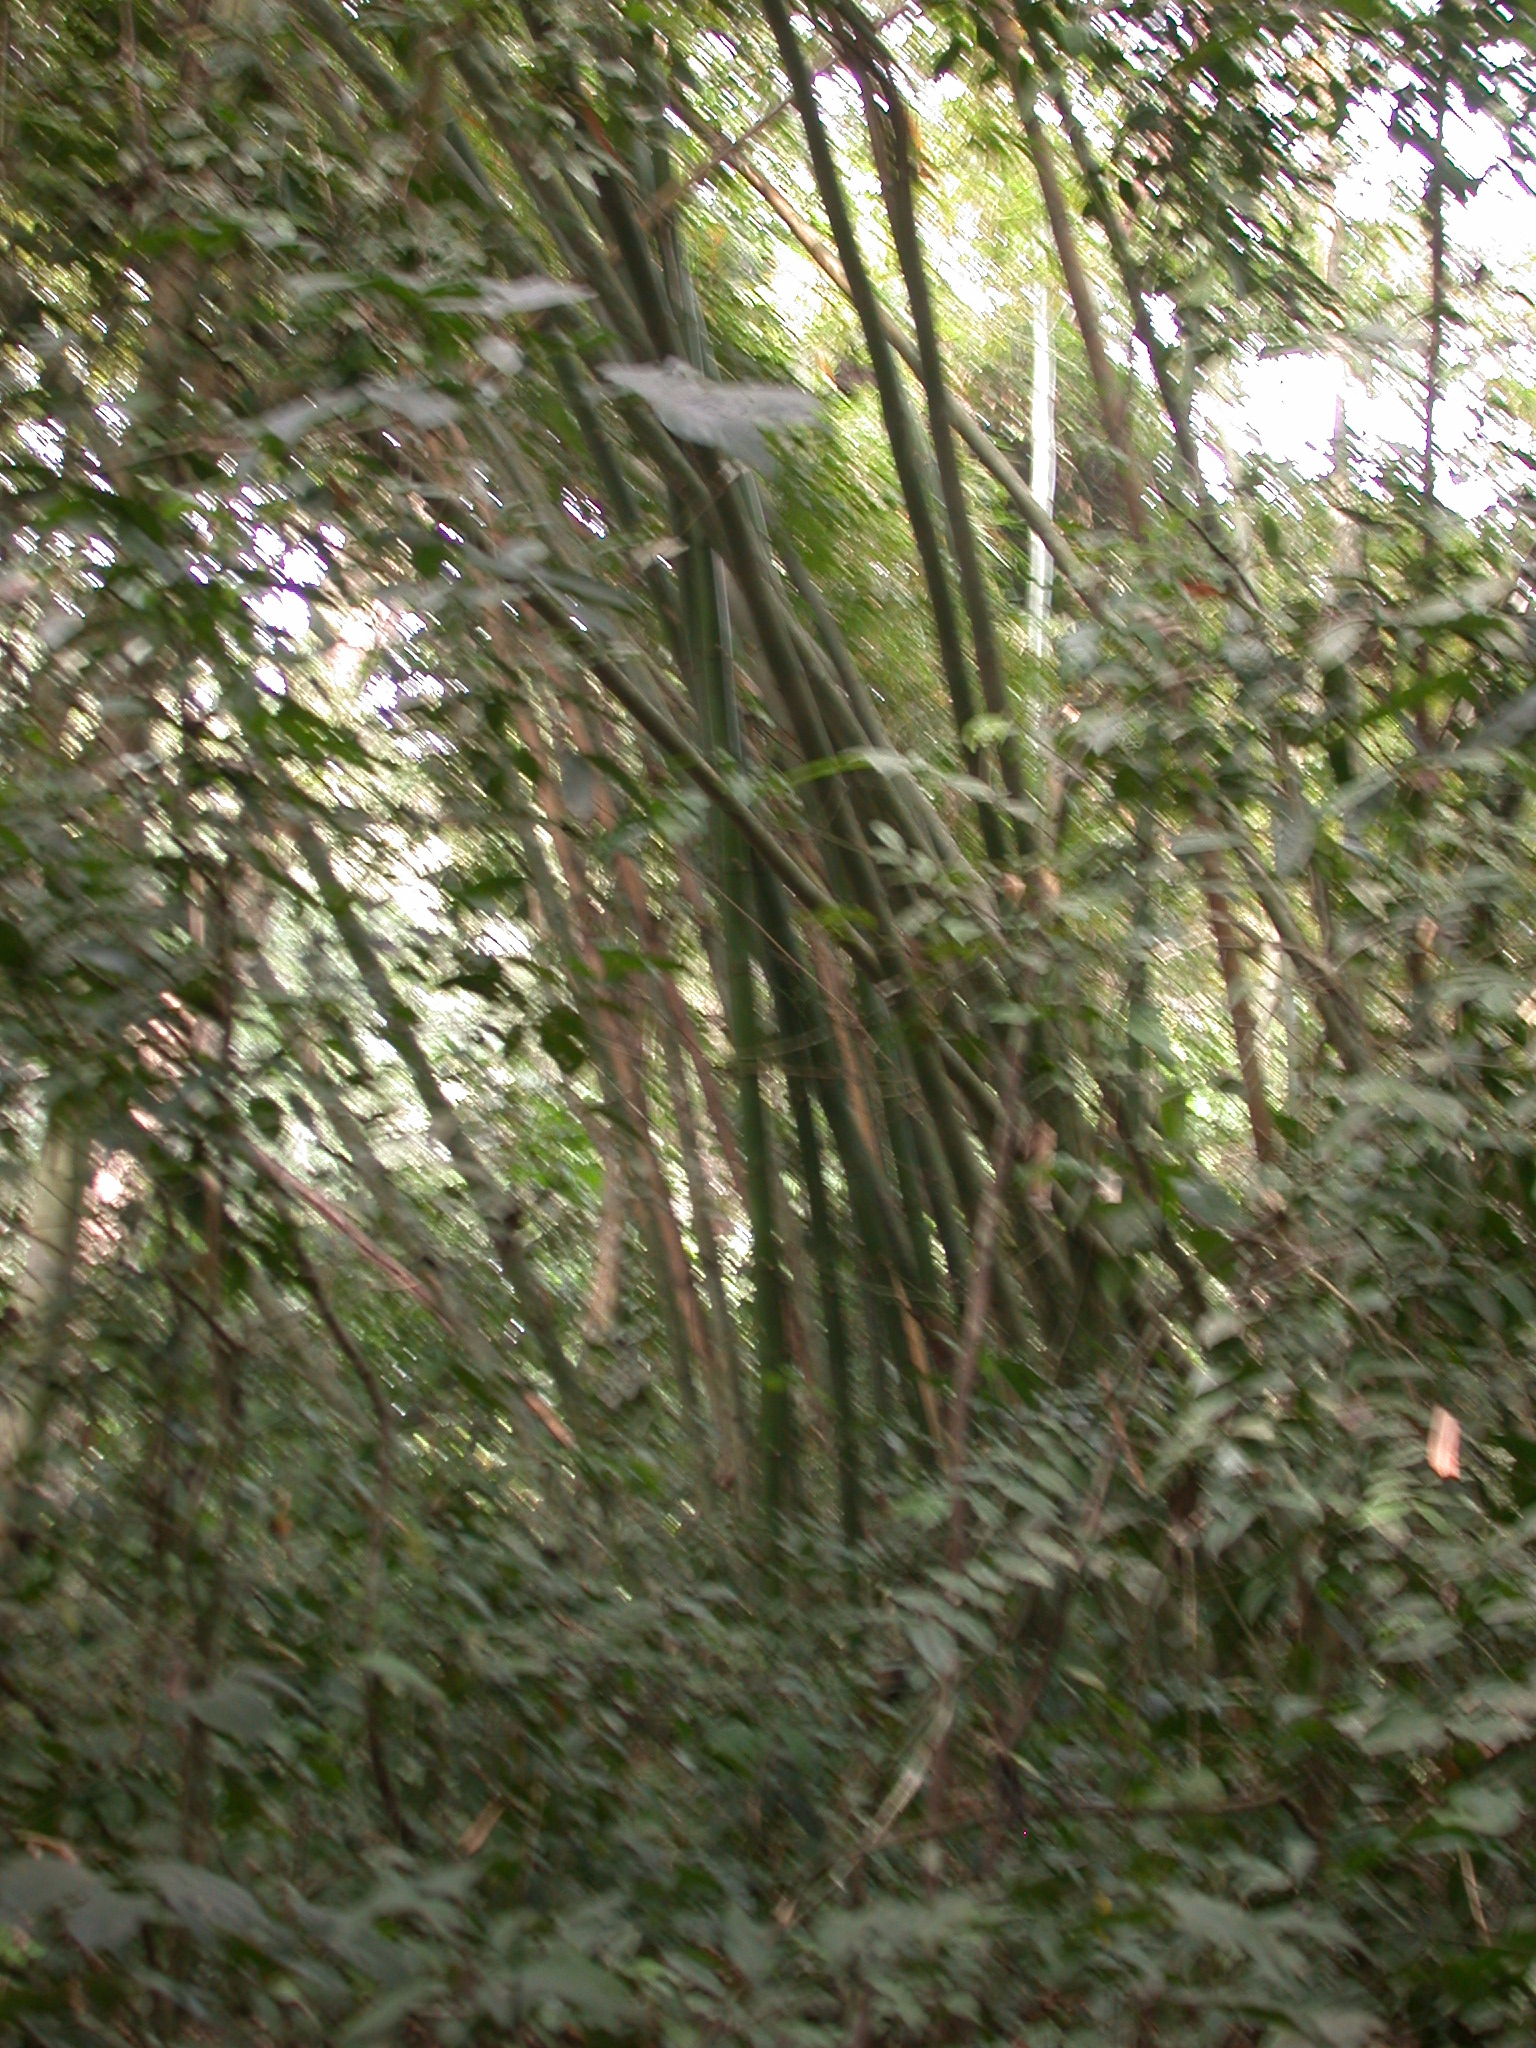 Bamboo by Osun River, Osun Sacred Grove, Oshogbo, Nigeria